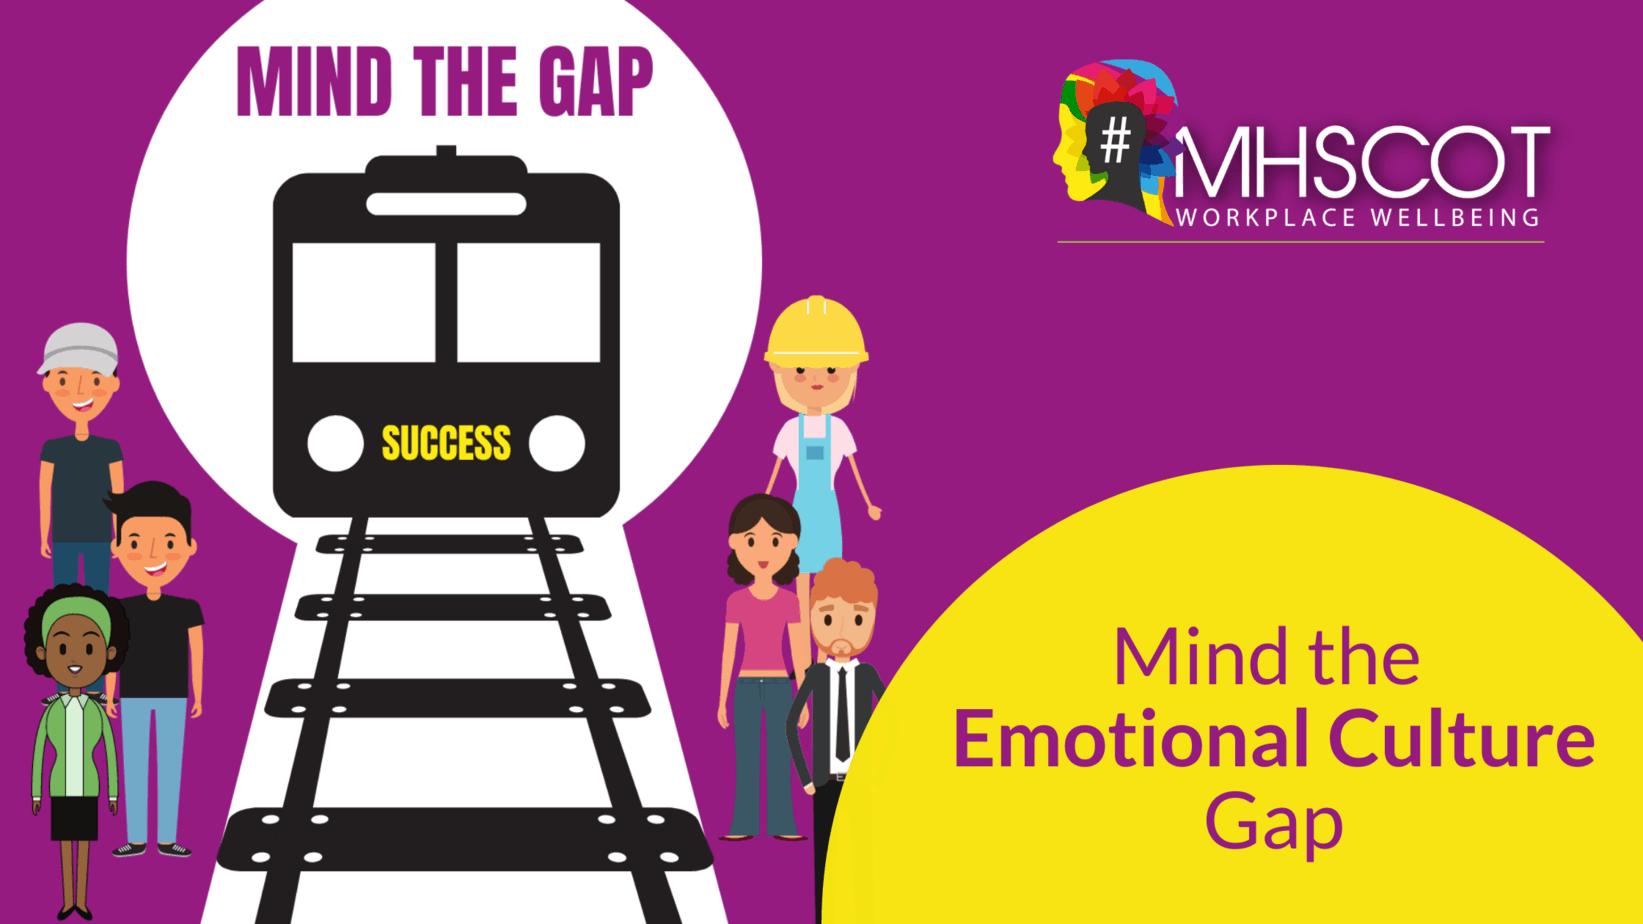 Mind the Emotional Culture Gap